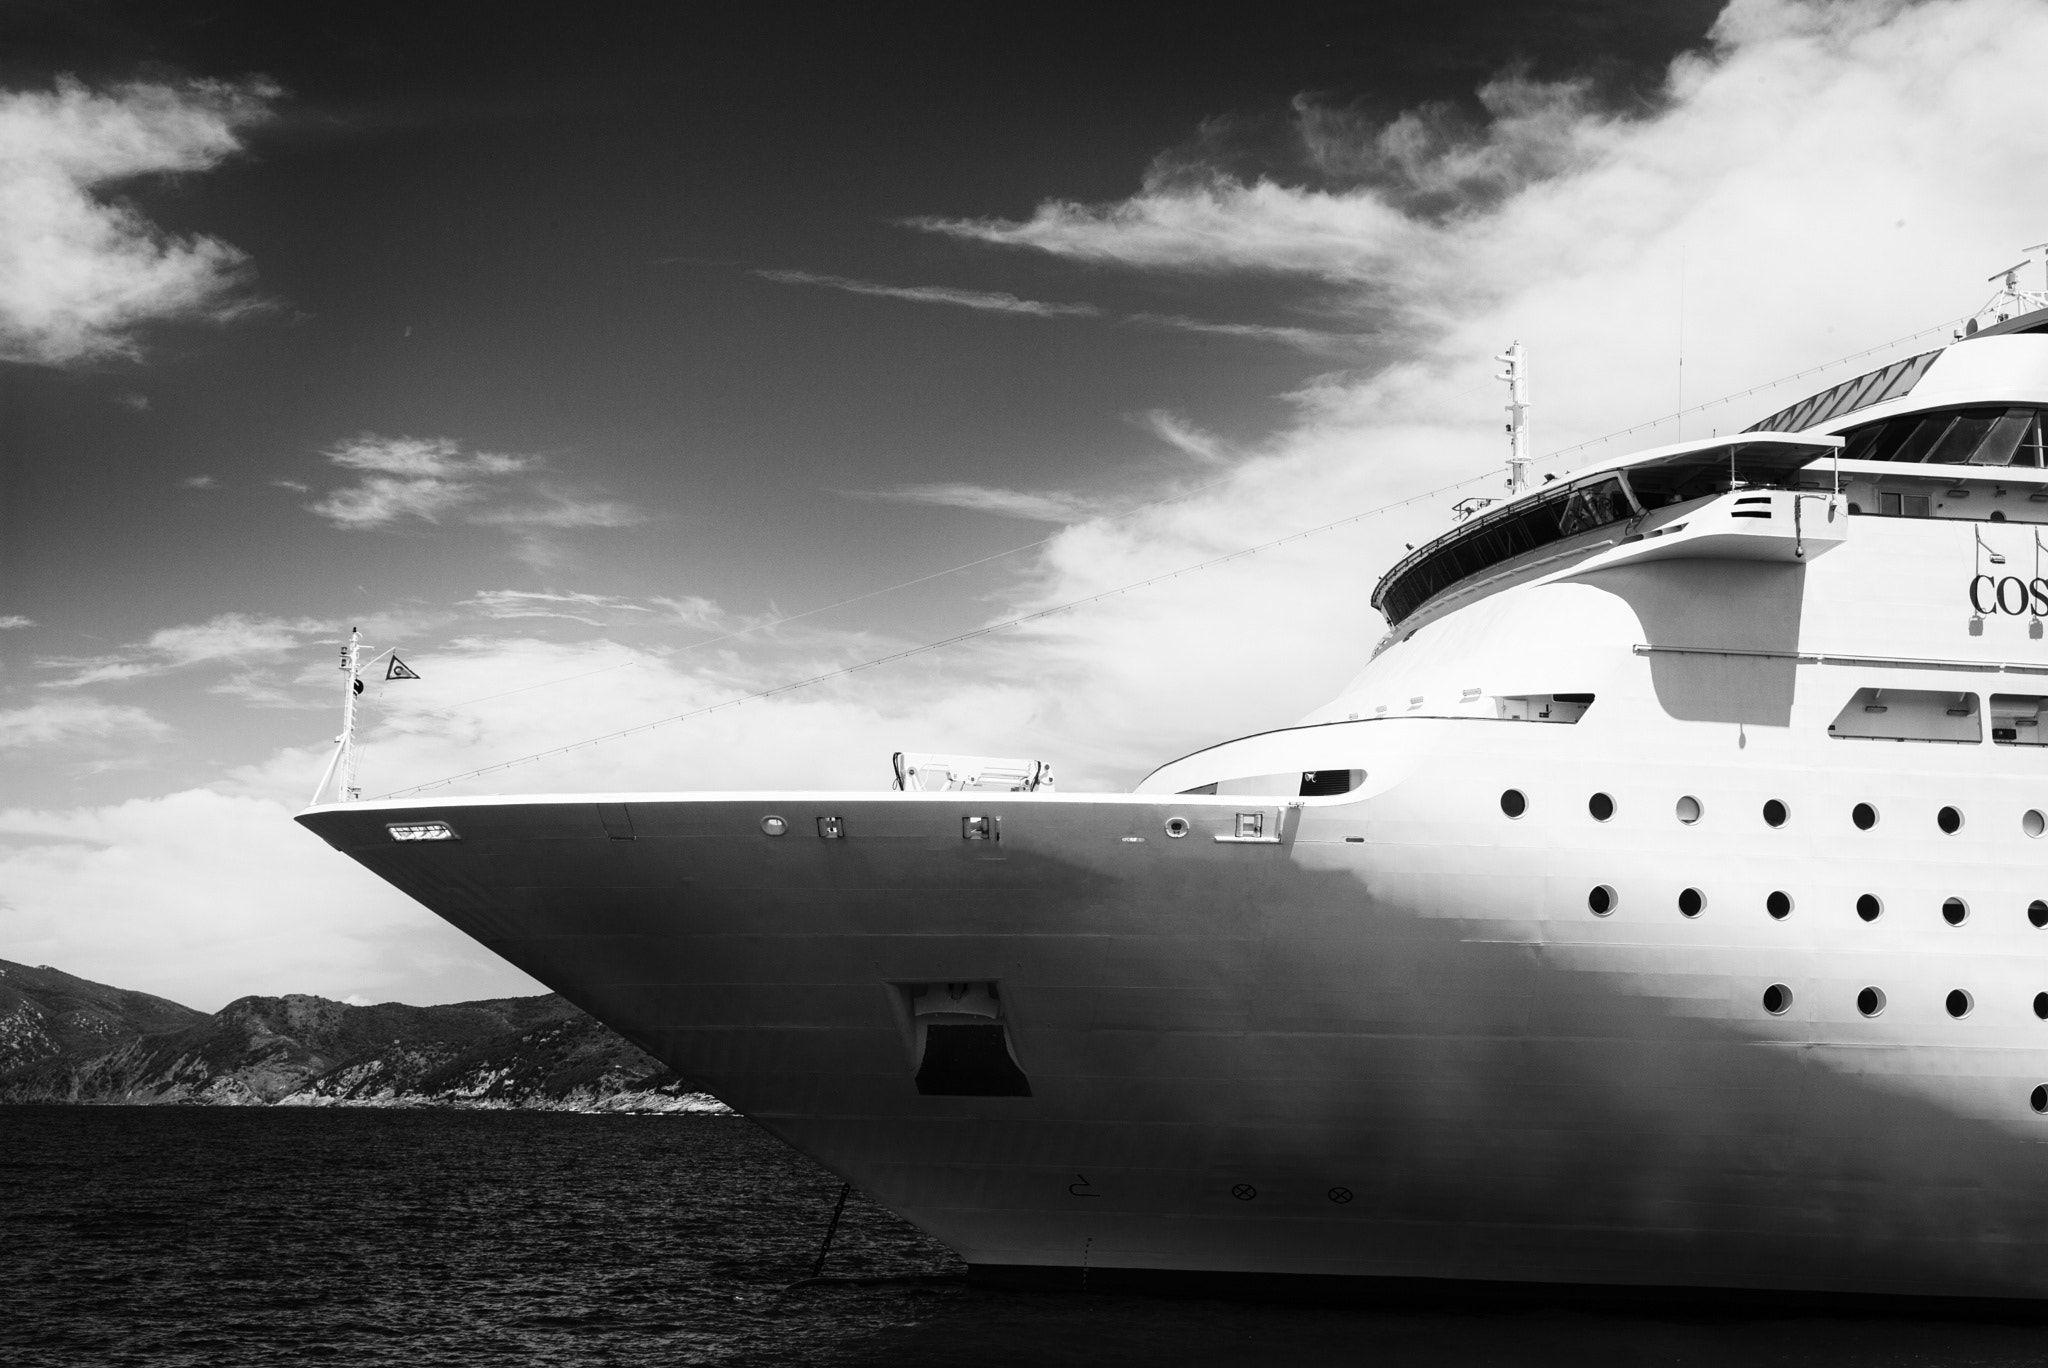 GiantL - a huge ship italy coastline